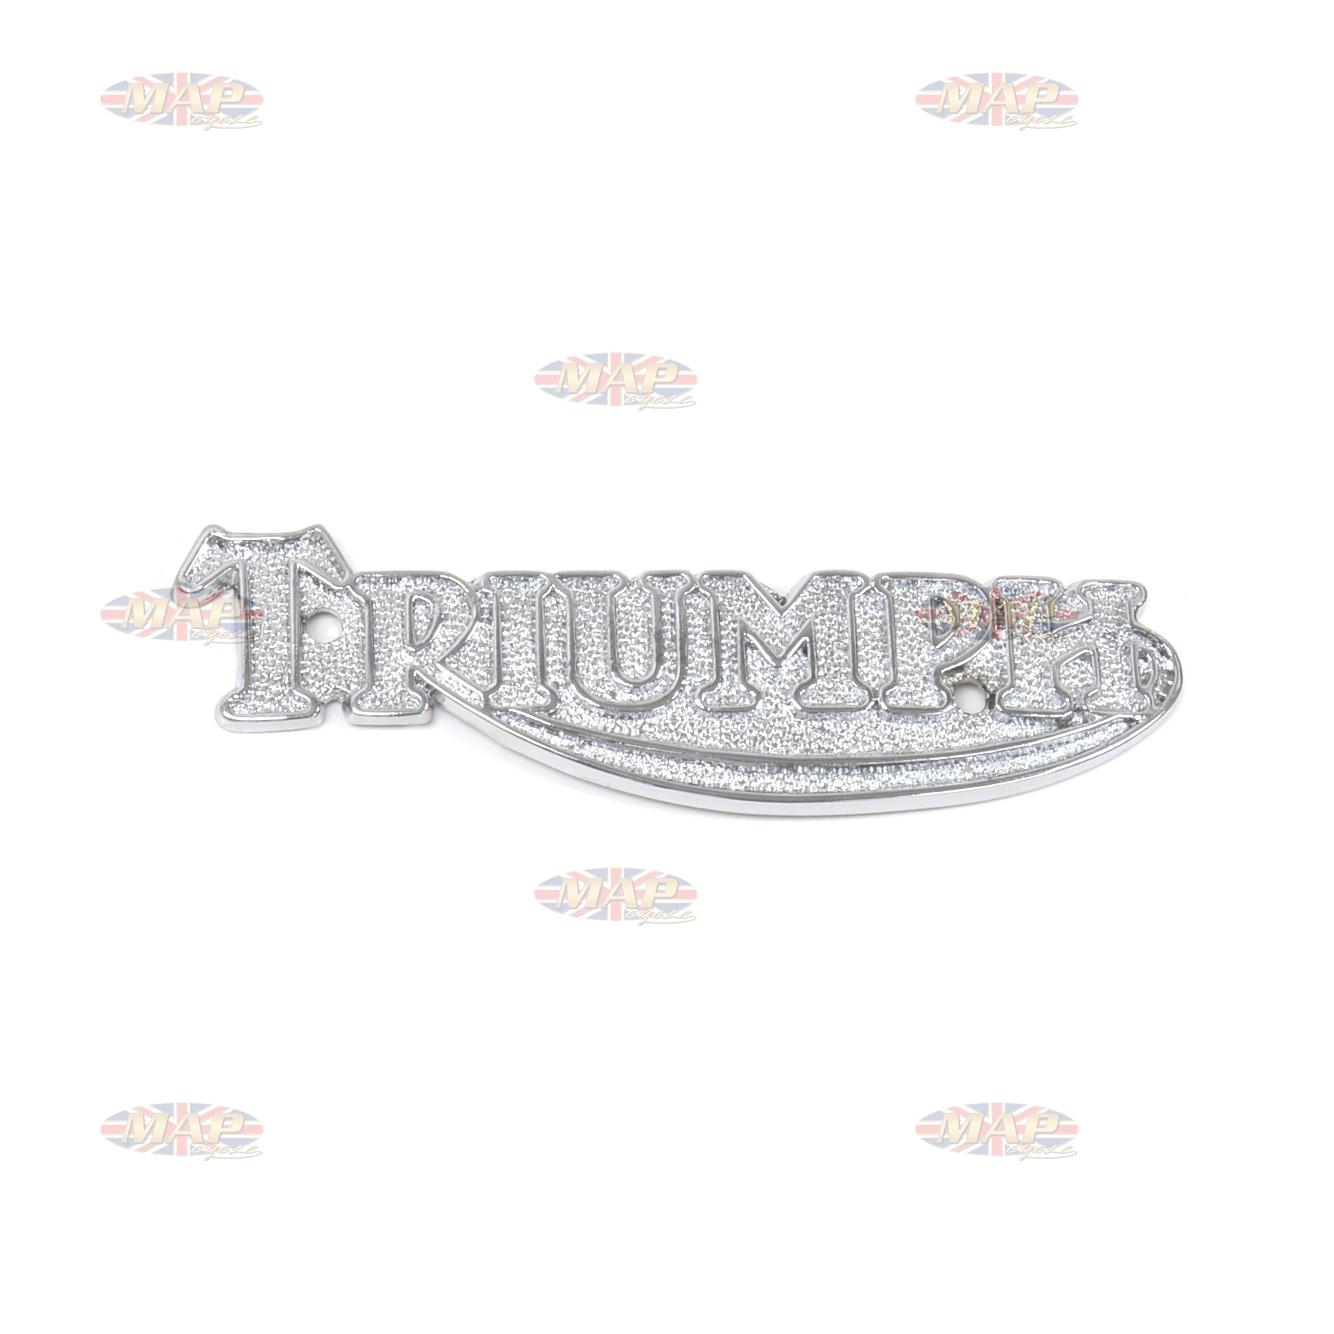 Triumph T140-TR7, English-Made, Tank Badge (sold individually)  60-2569